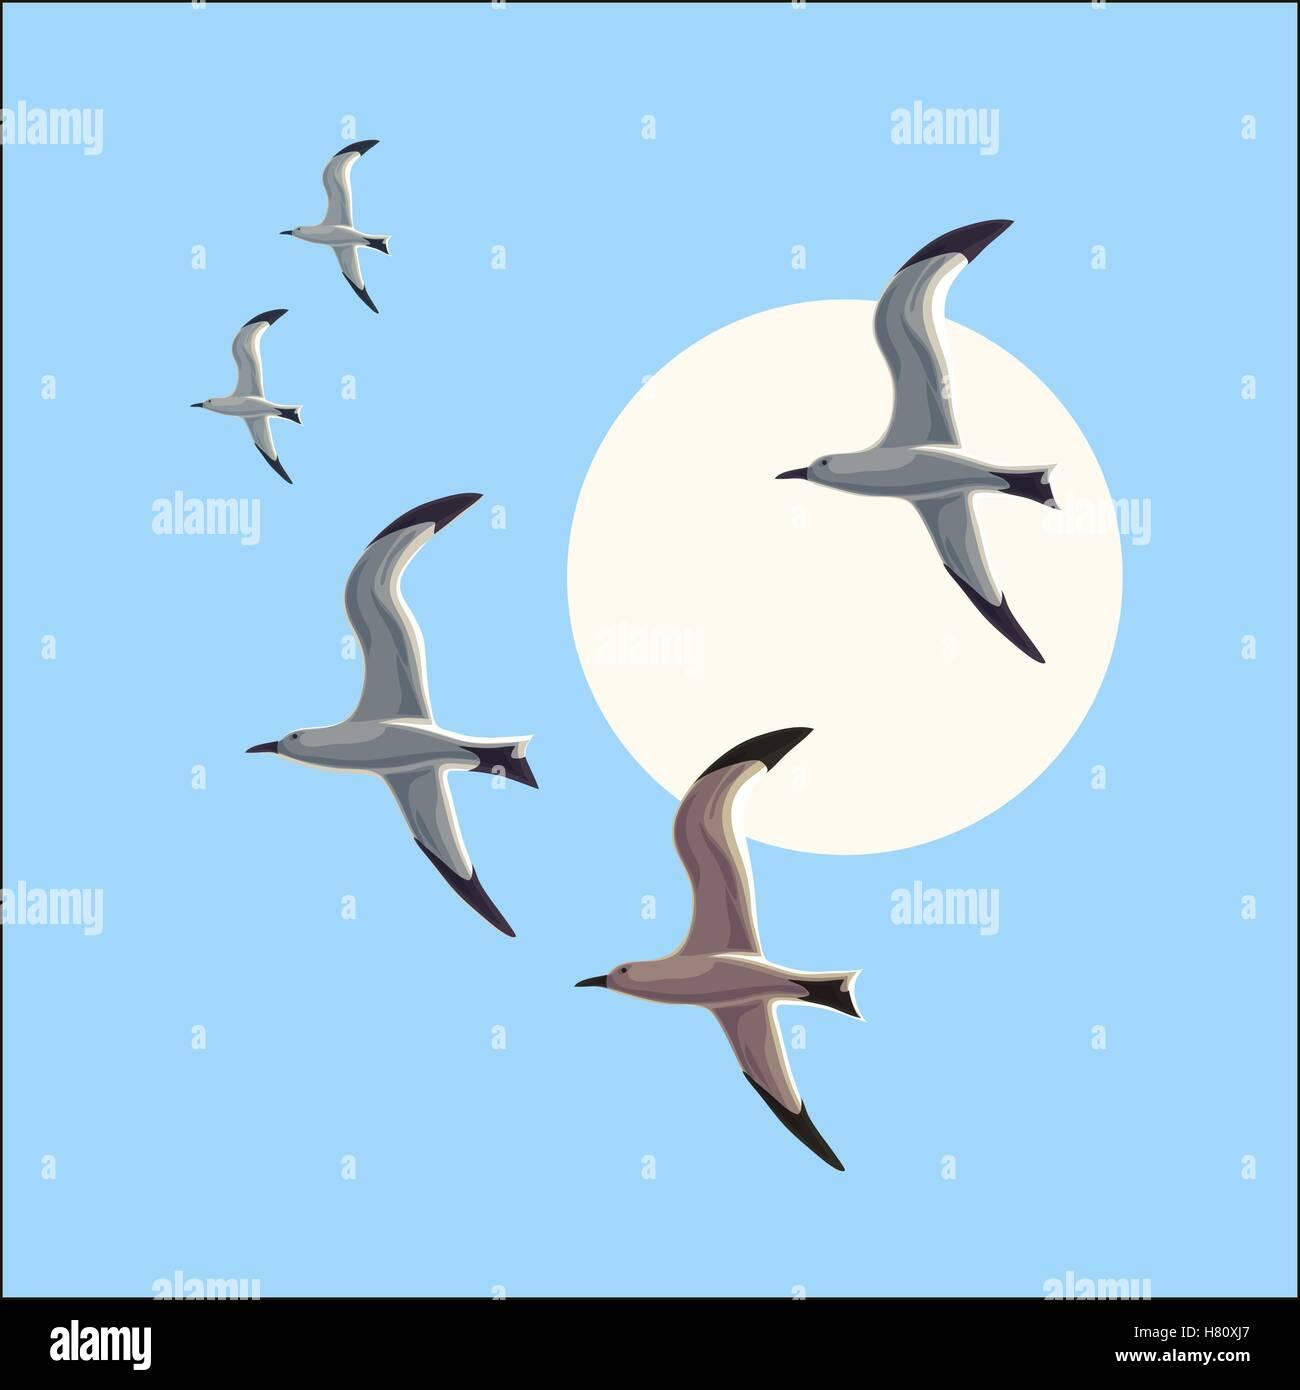 Seagull in flight against the blue sky - Stock Vector